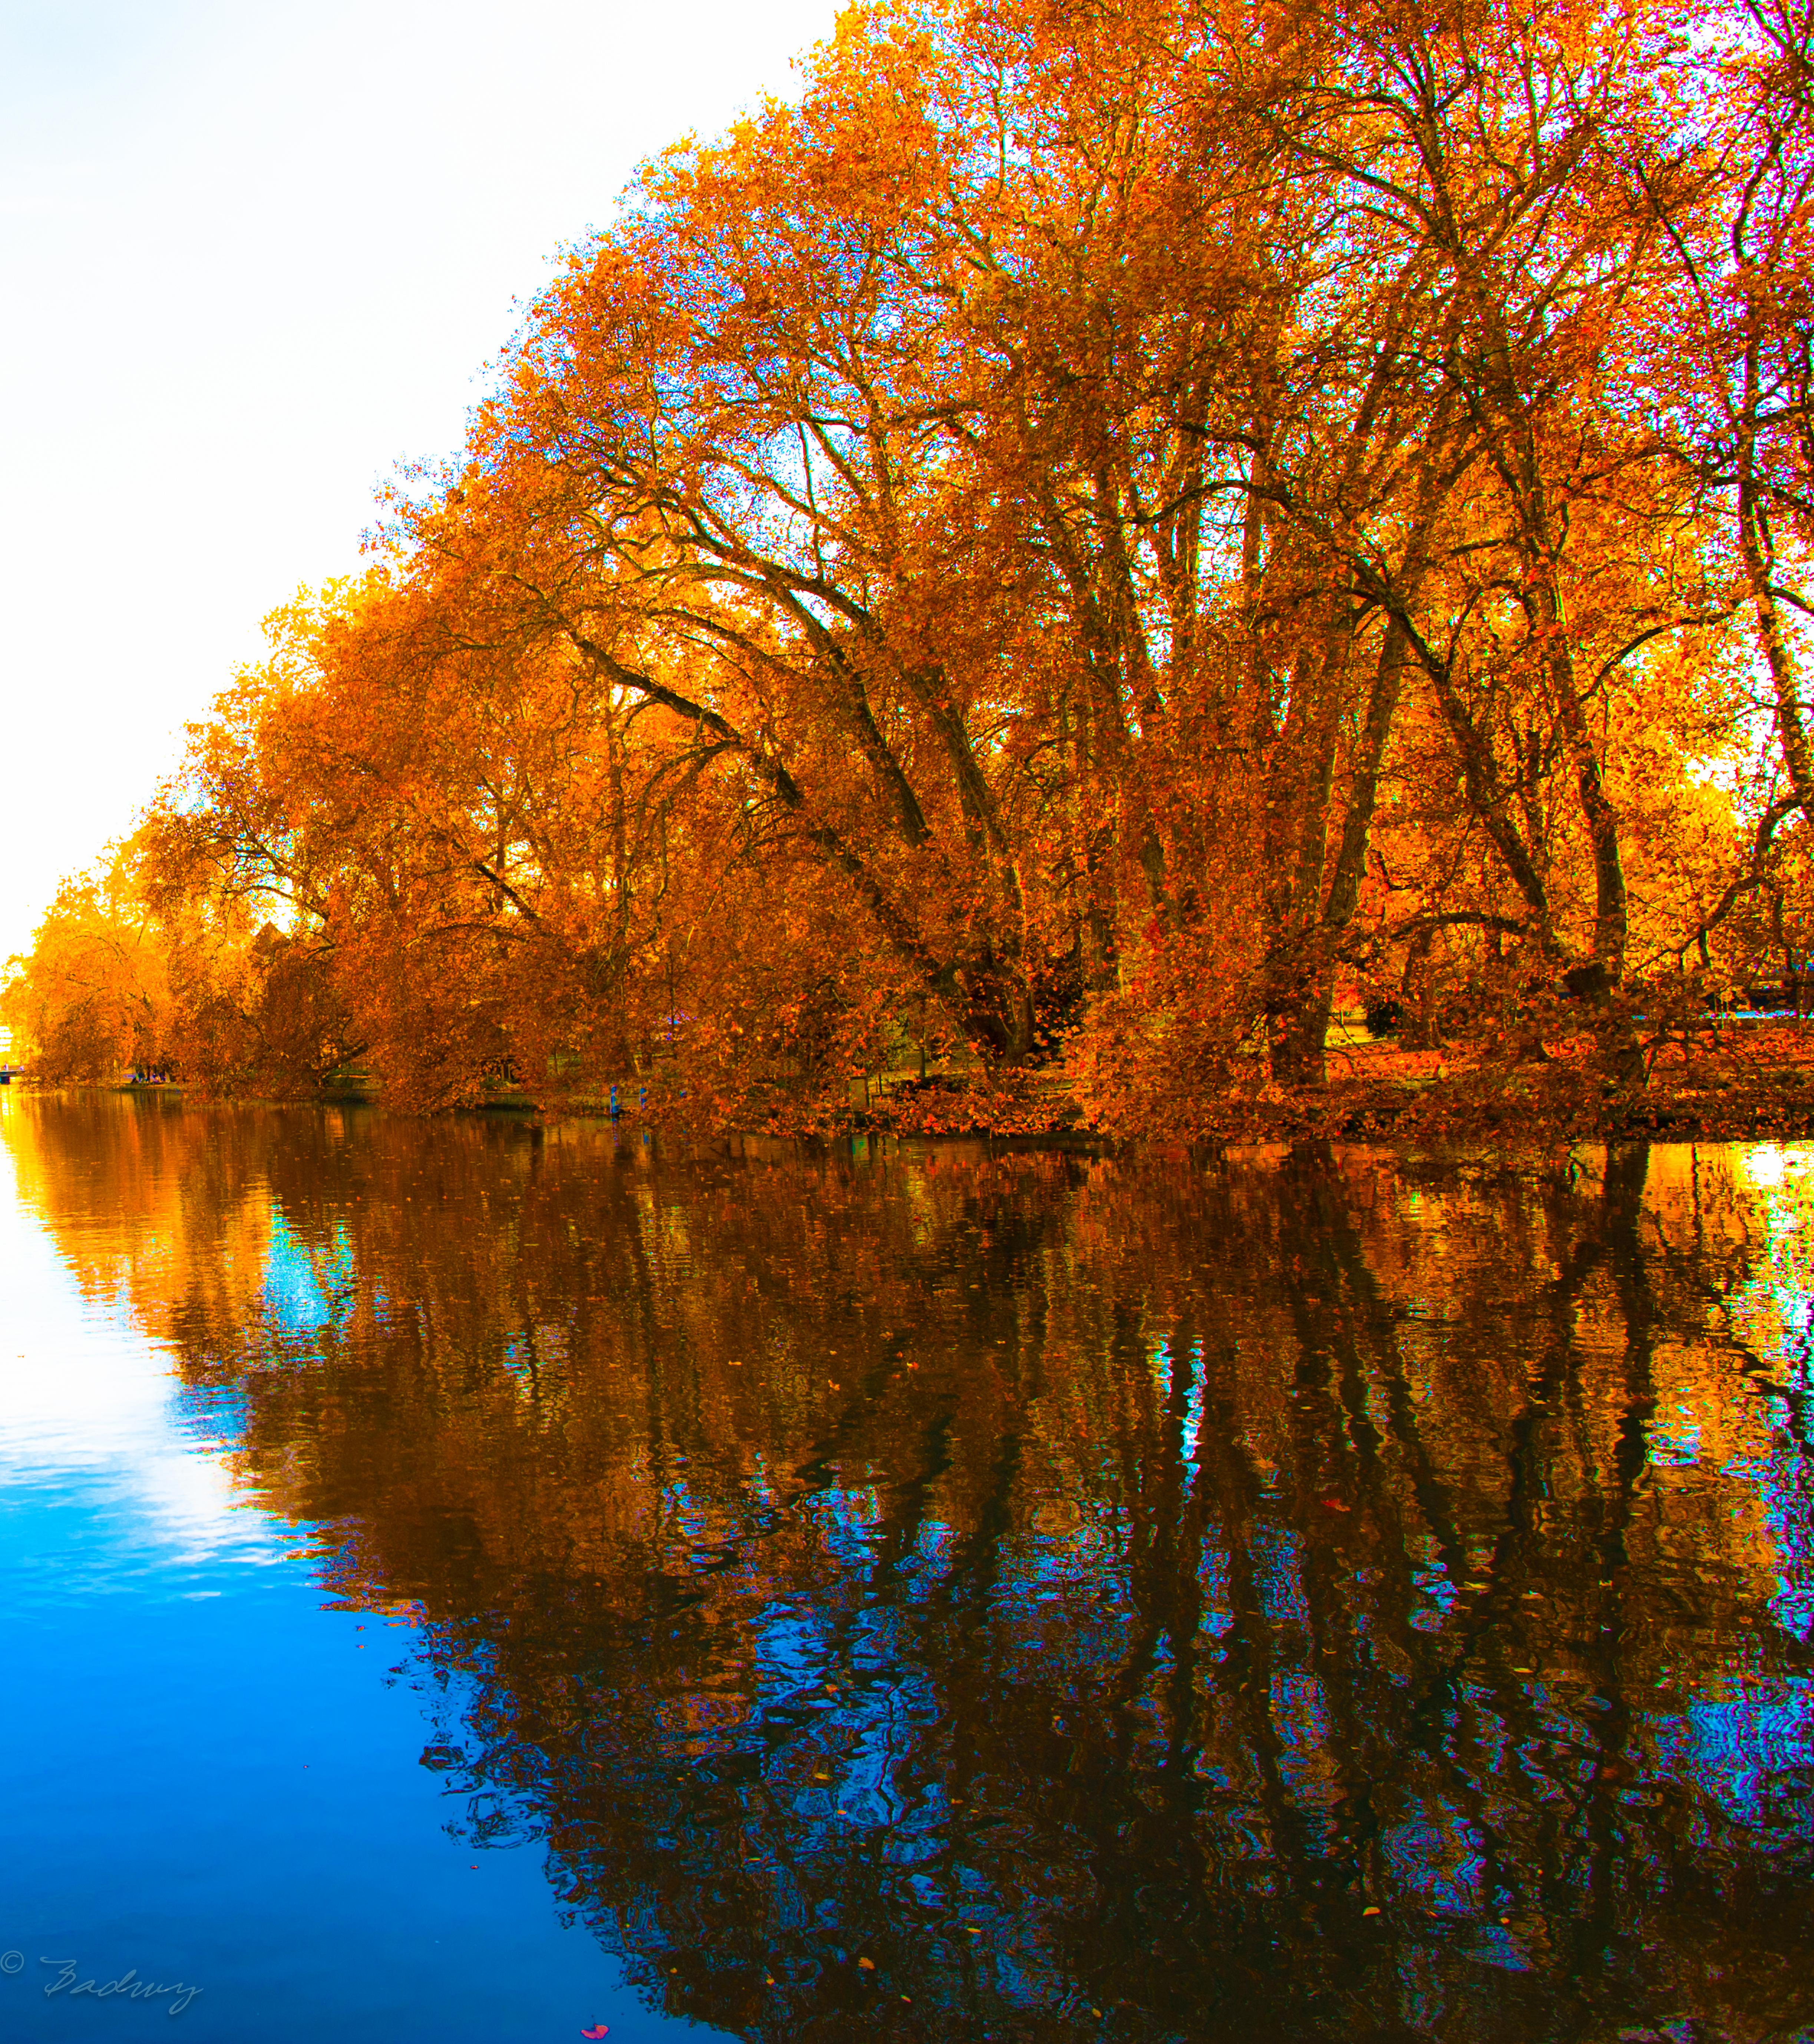 File:Golden Time , Zurich 4 November 2010 - panoramio jpg